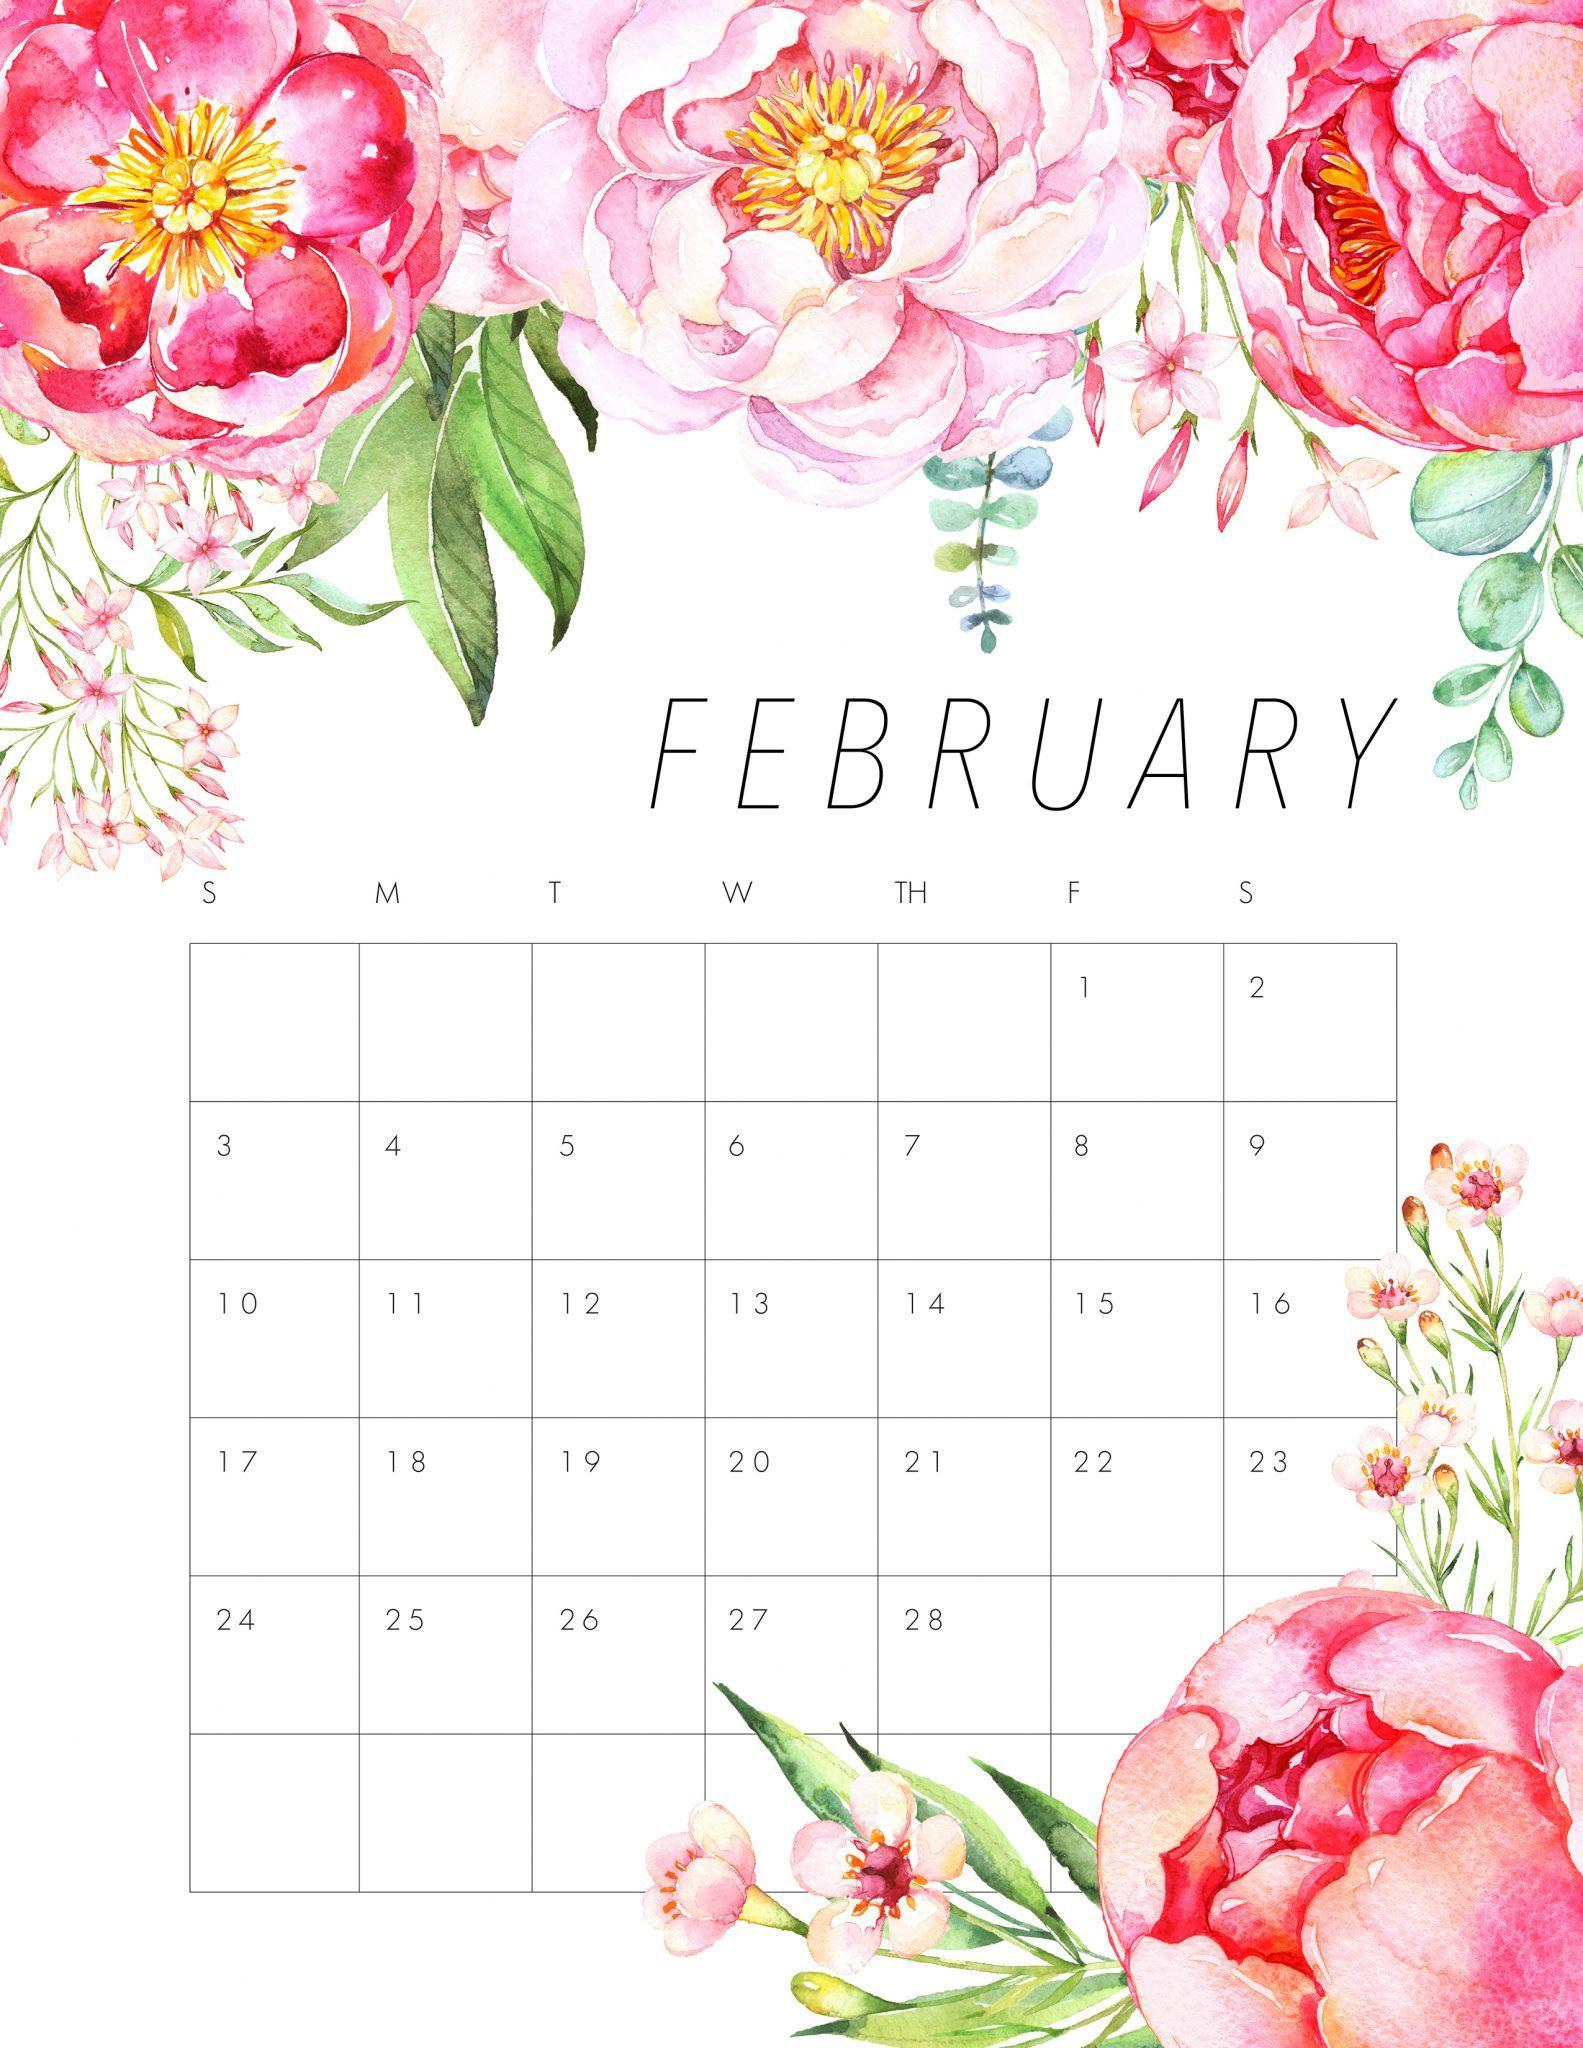 February 2019 Calendar Tumblr February 2019 Calendar Tumblr | February 2019 Calendar Printable